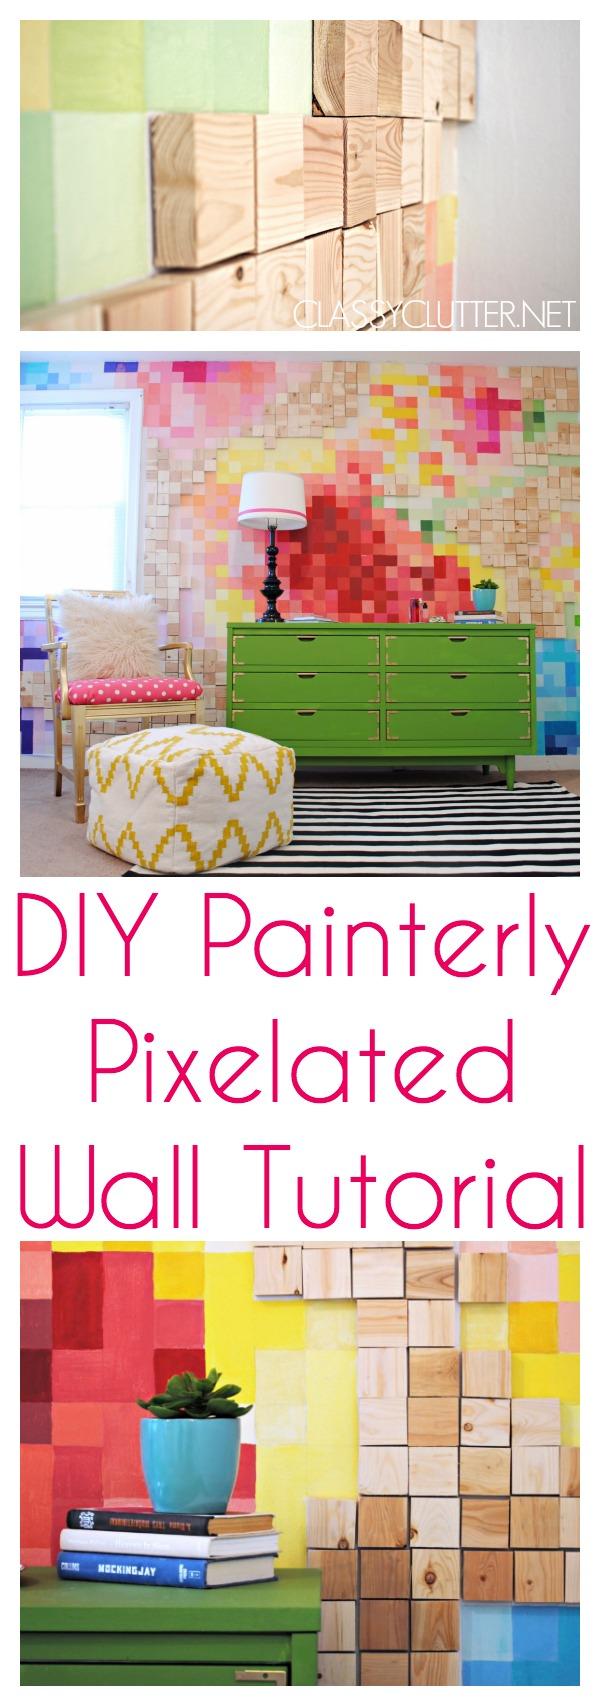 DIY-Painterly-Pixelated-Wall-Tutorial